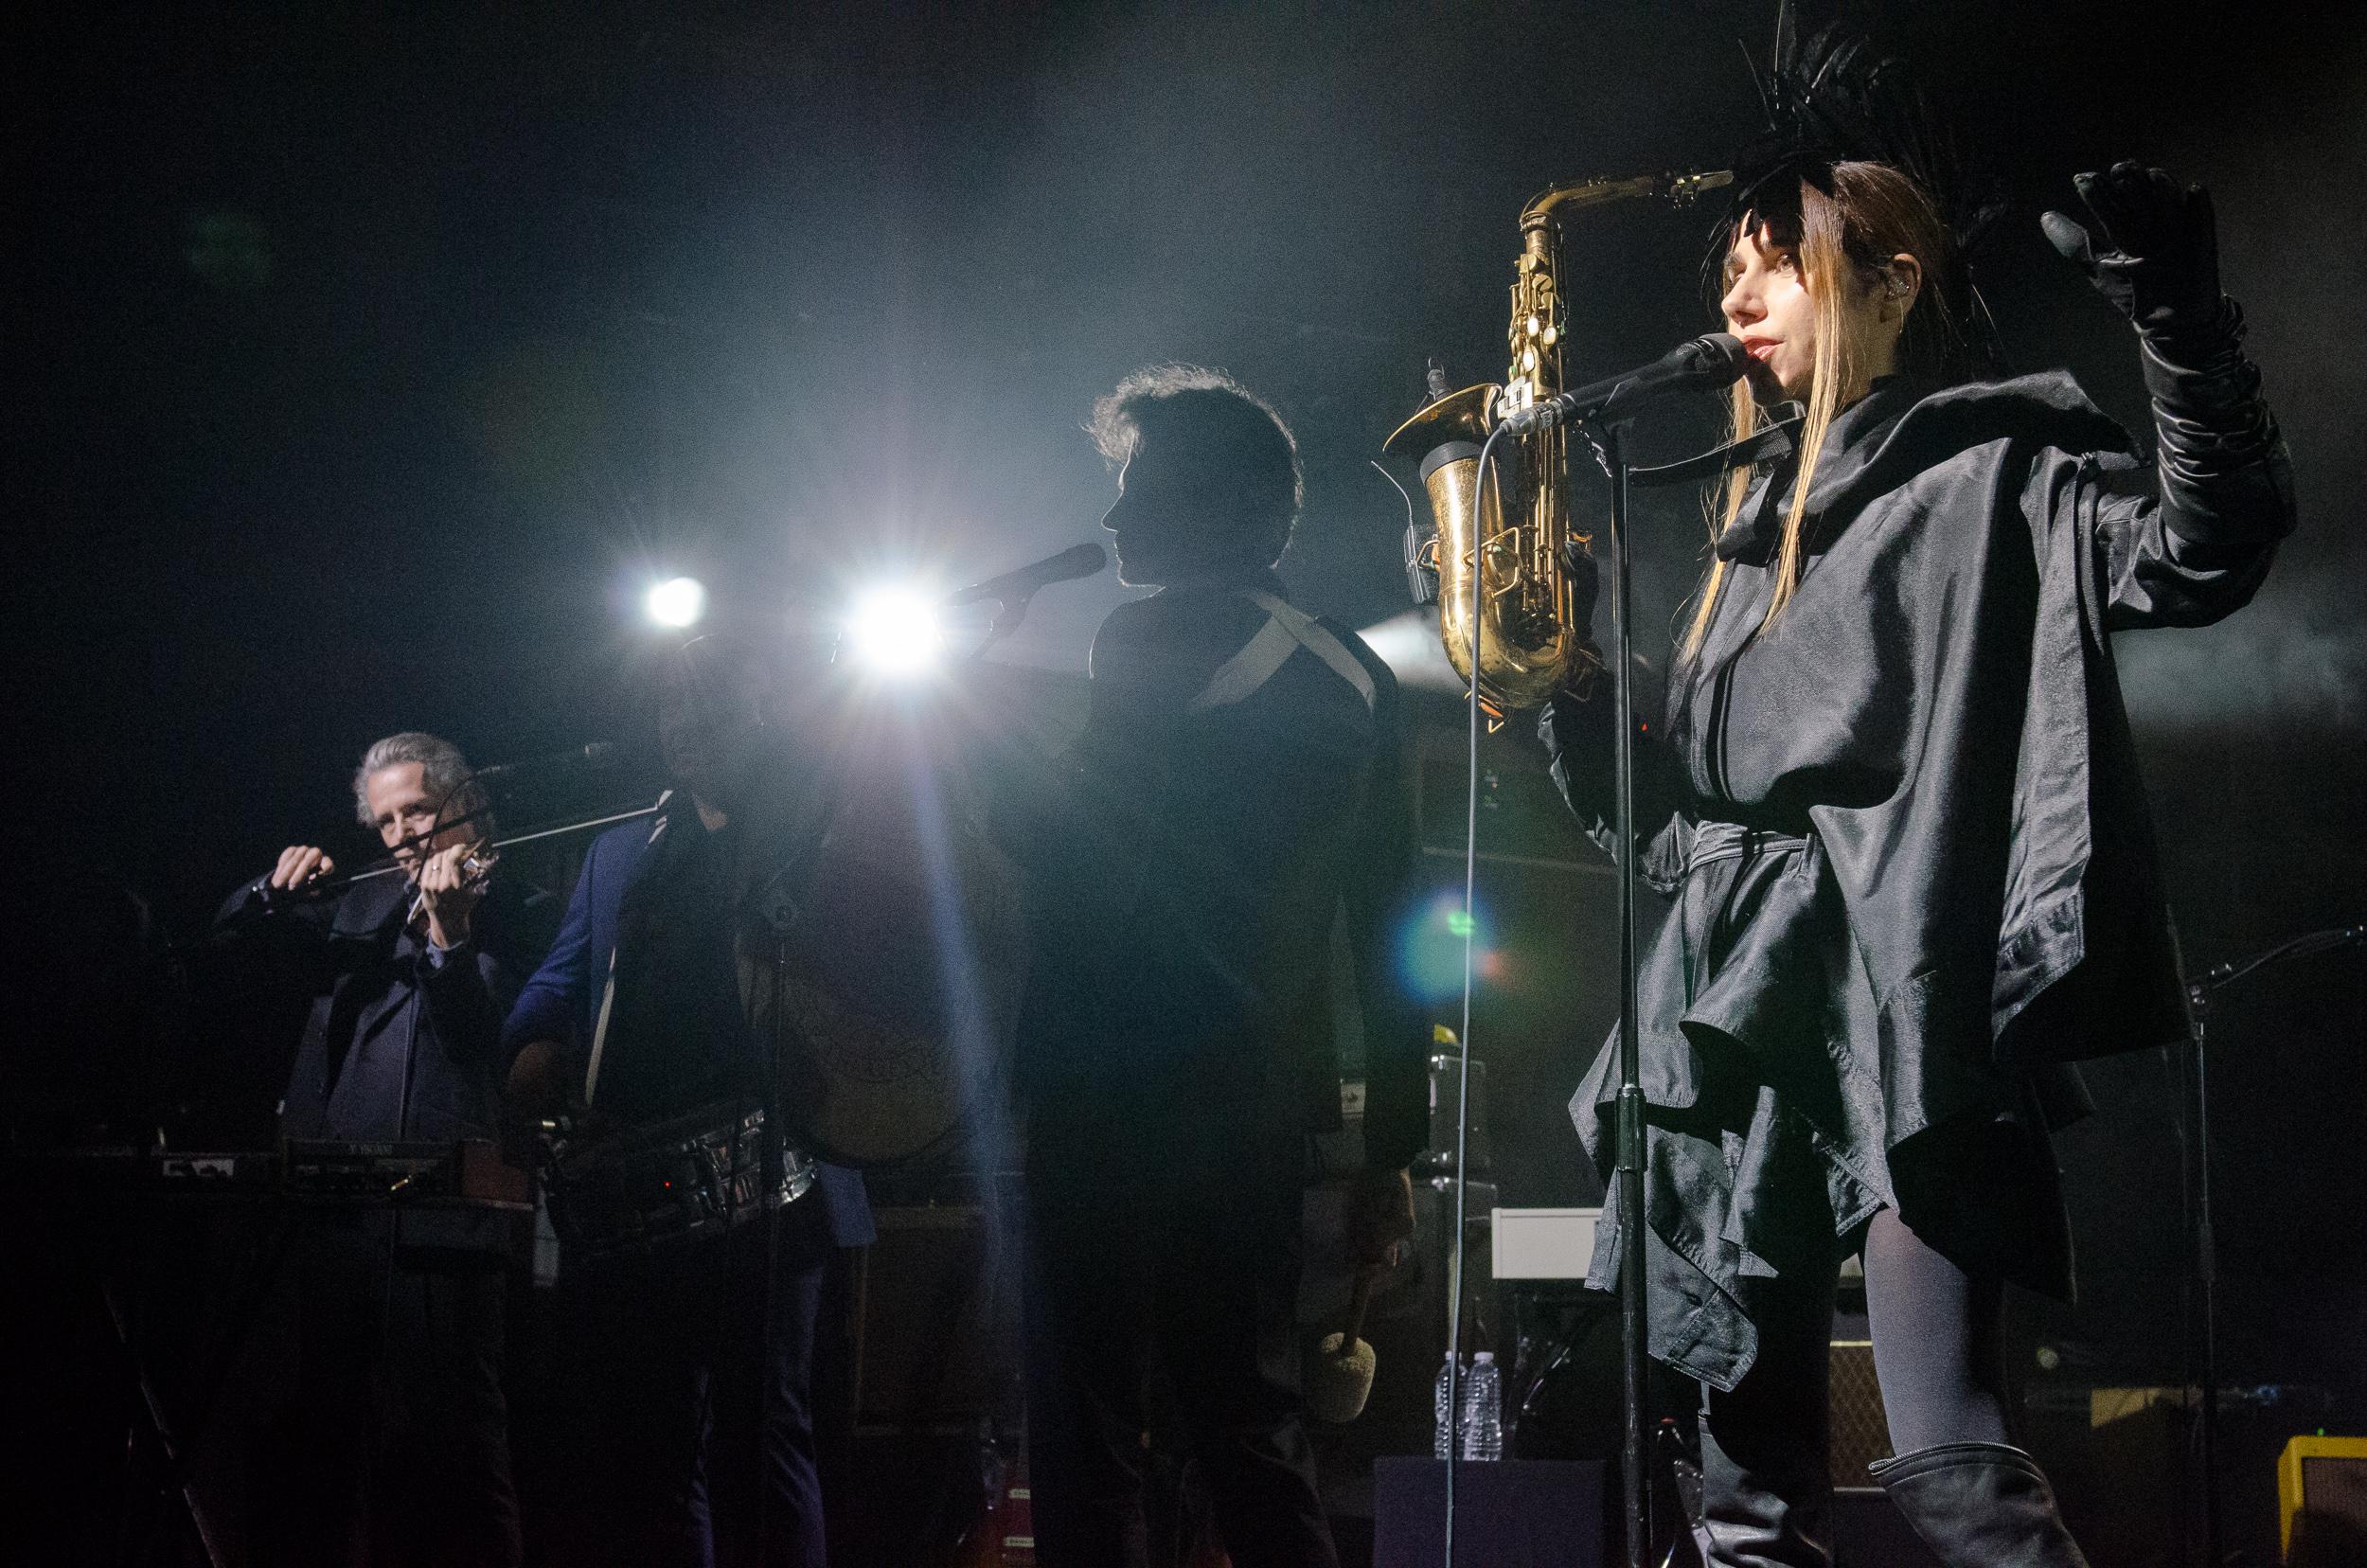 ben kaye pj harvey 6 Live Review: PJ Harvey at New Yorks Brooklyn Steel (4/20)